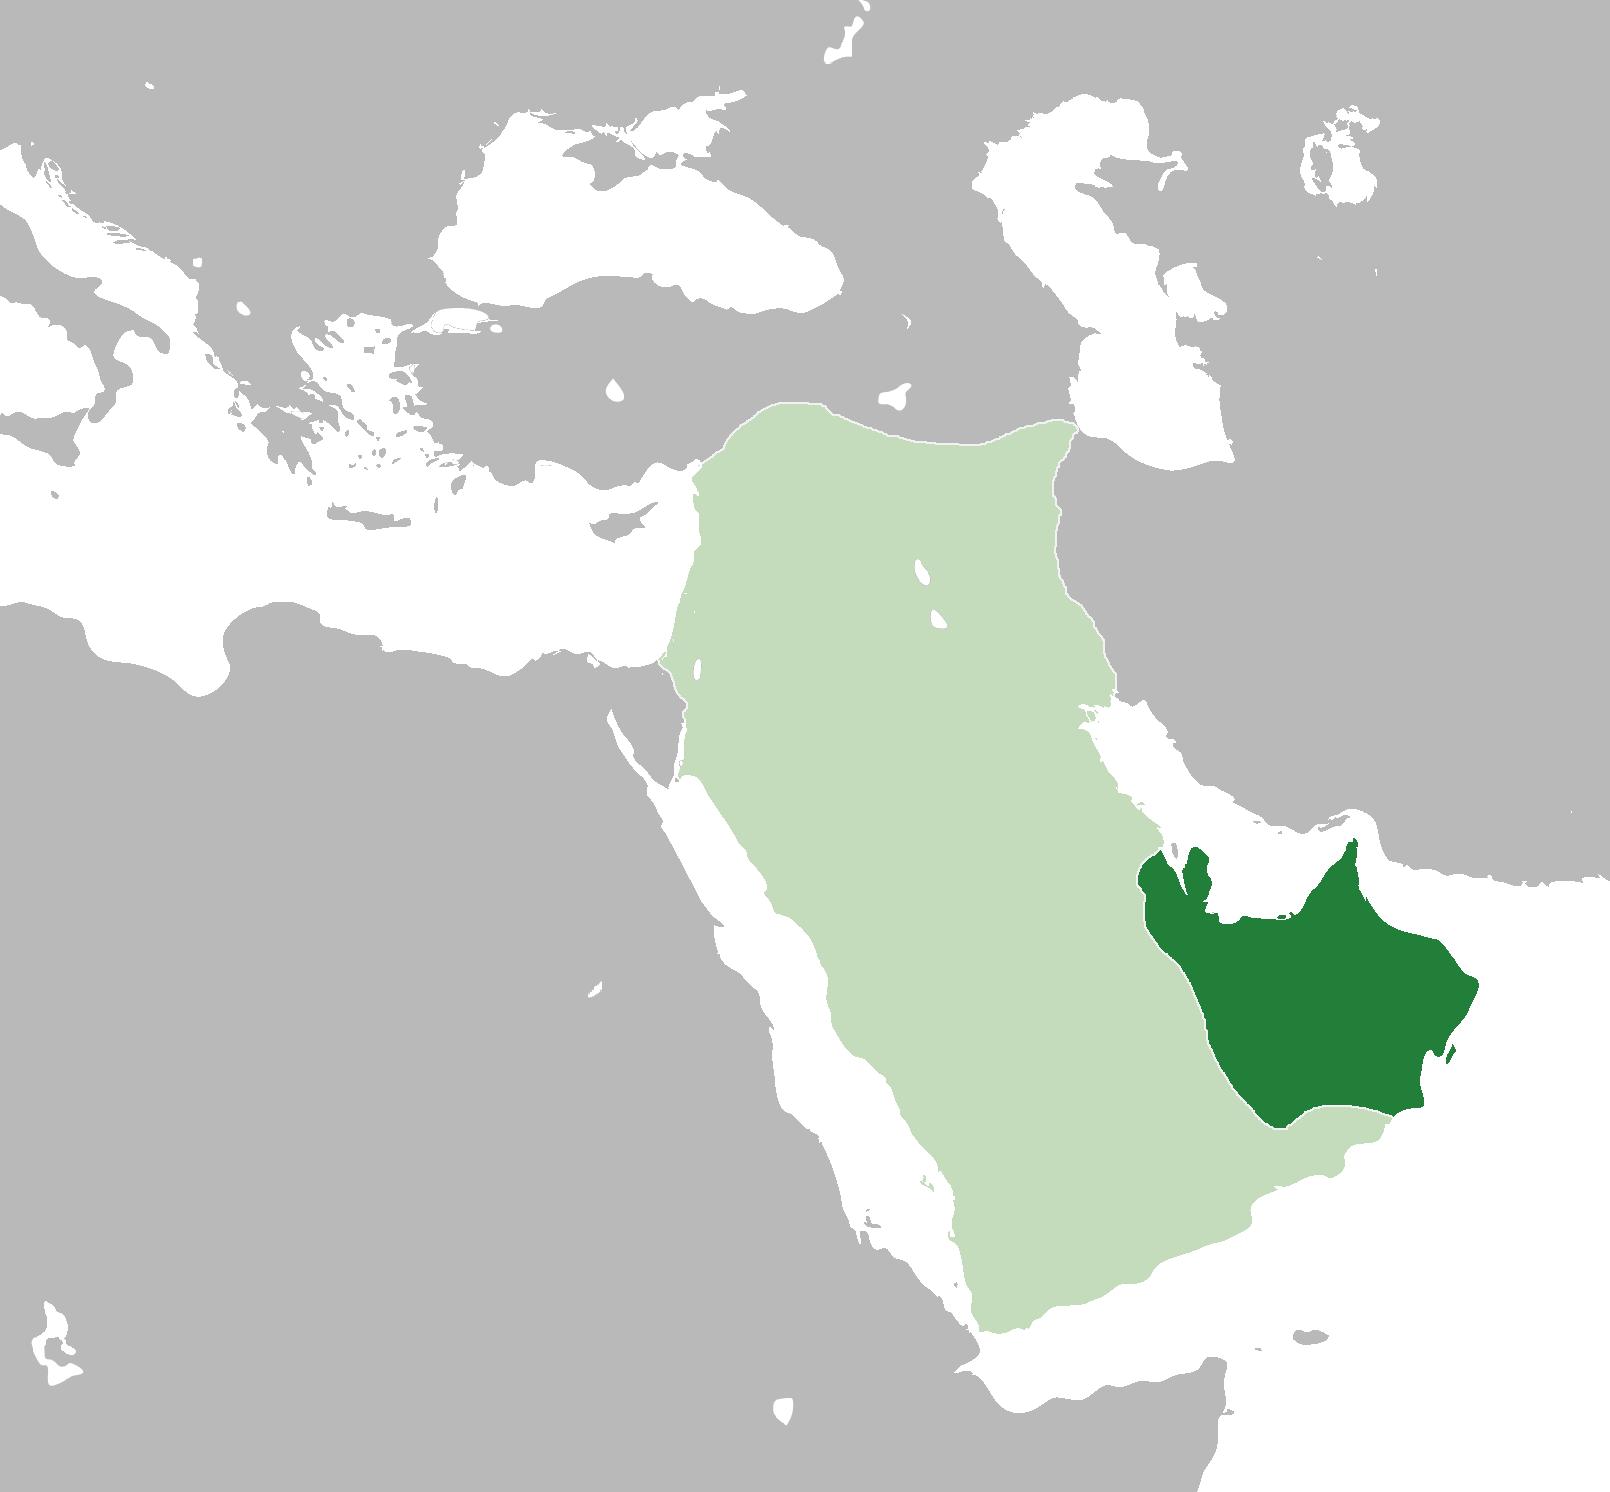 Oman Principia Moderni IV Map Game Alternative History - Oman map png